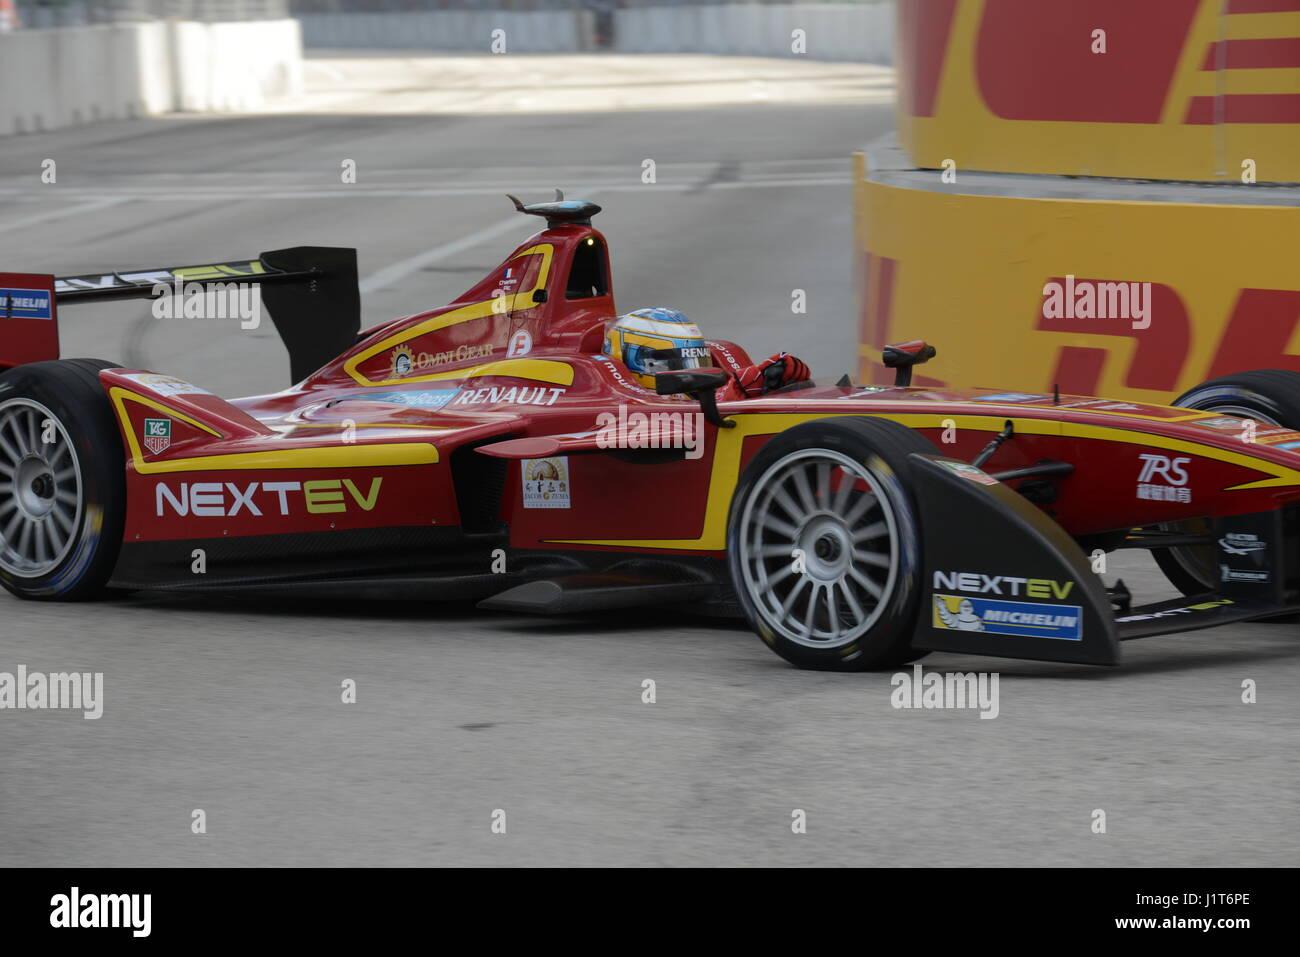 formula E racing on the streets - Stock Image